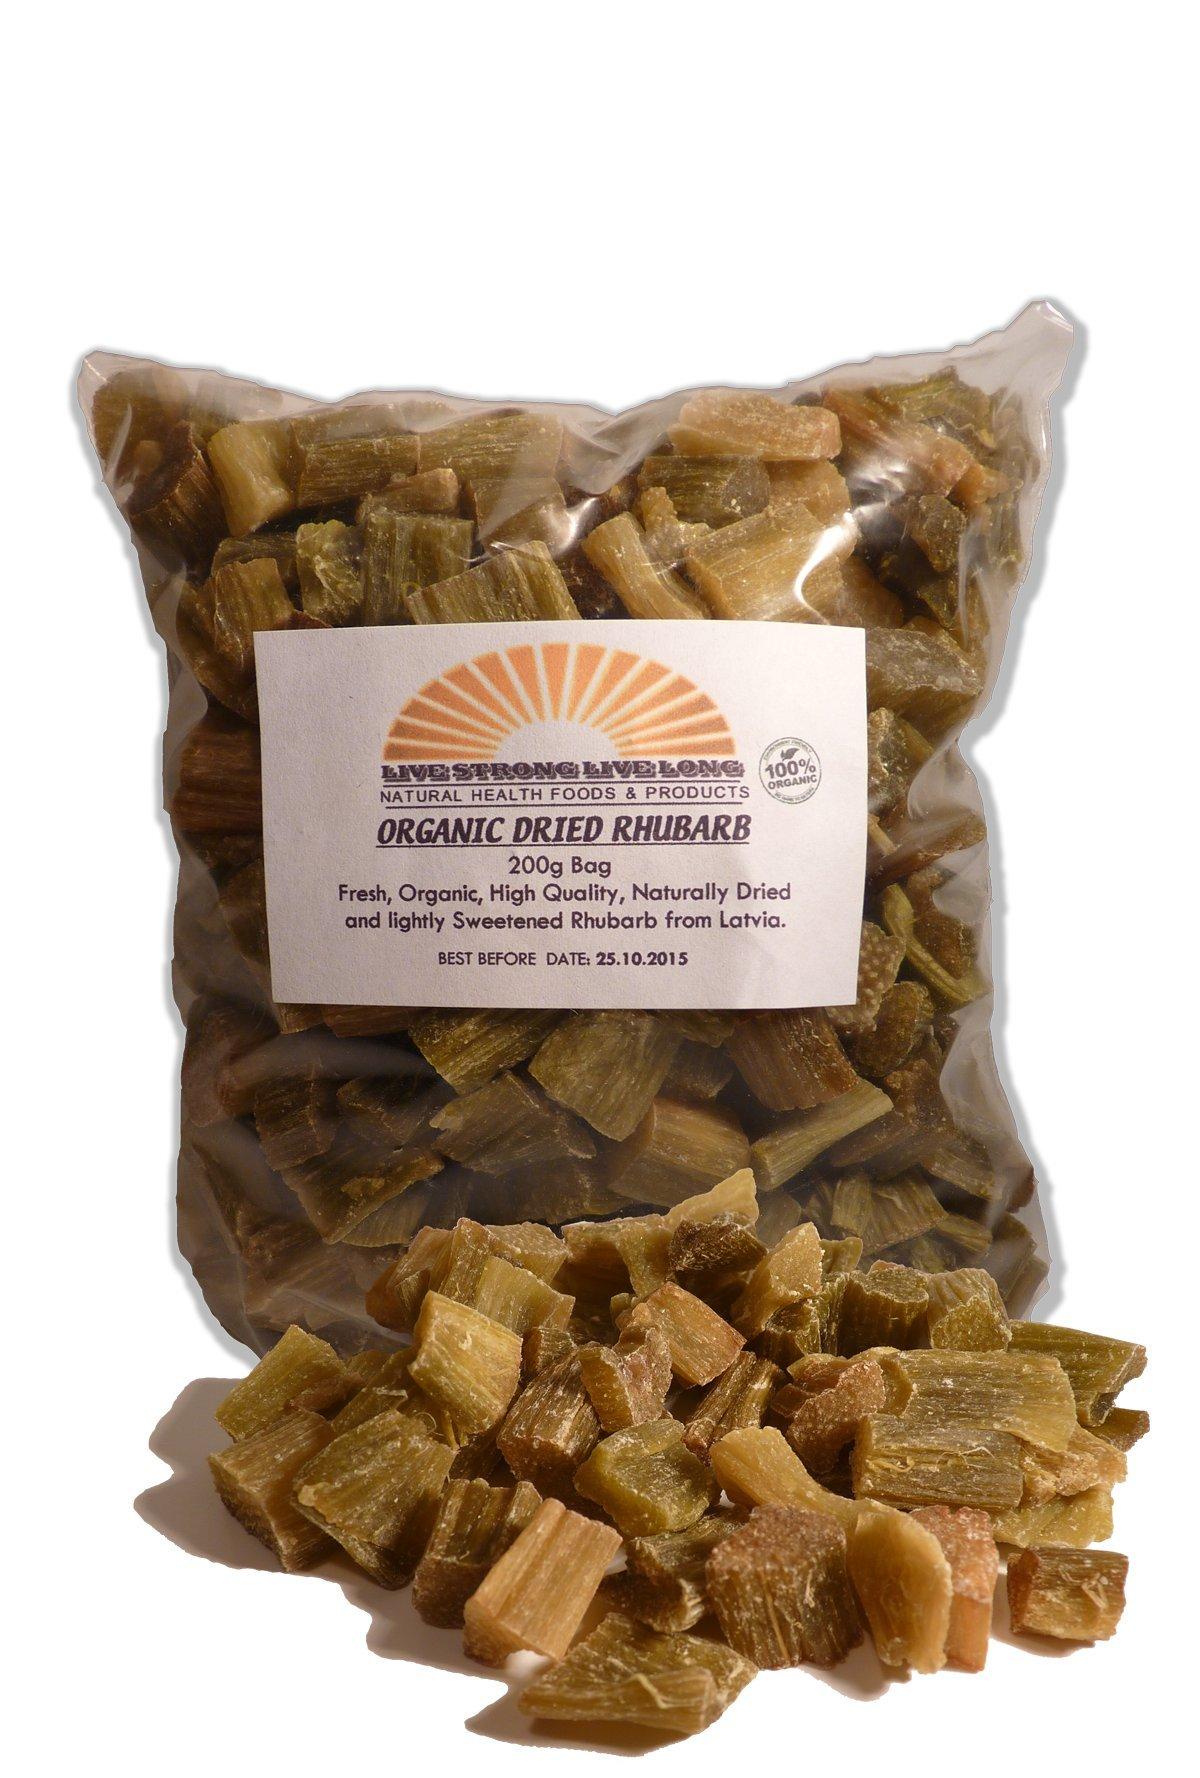 100% Organic Dried Rhubarb Pieces 200g Bag - 7oz